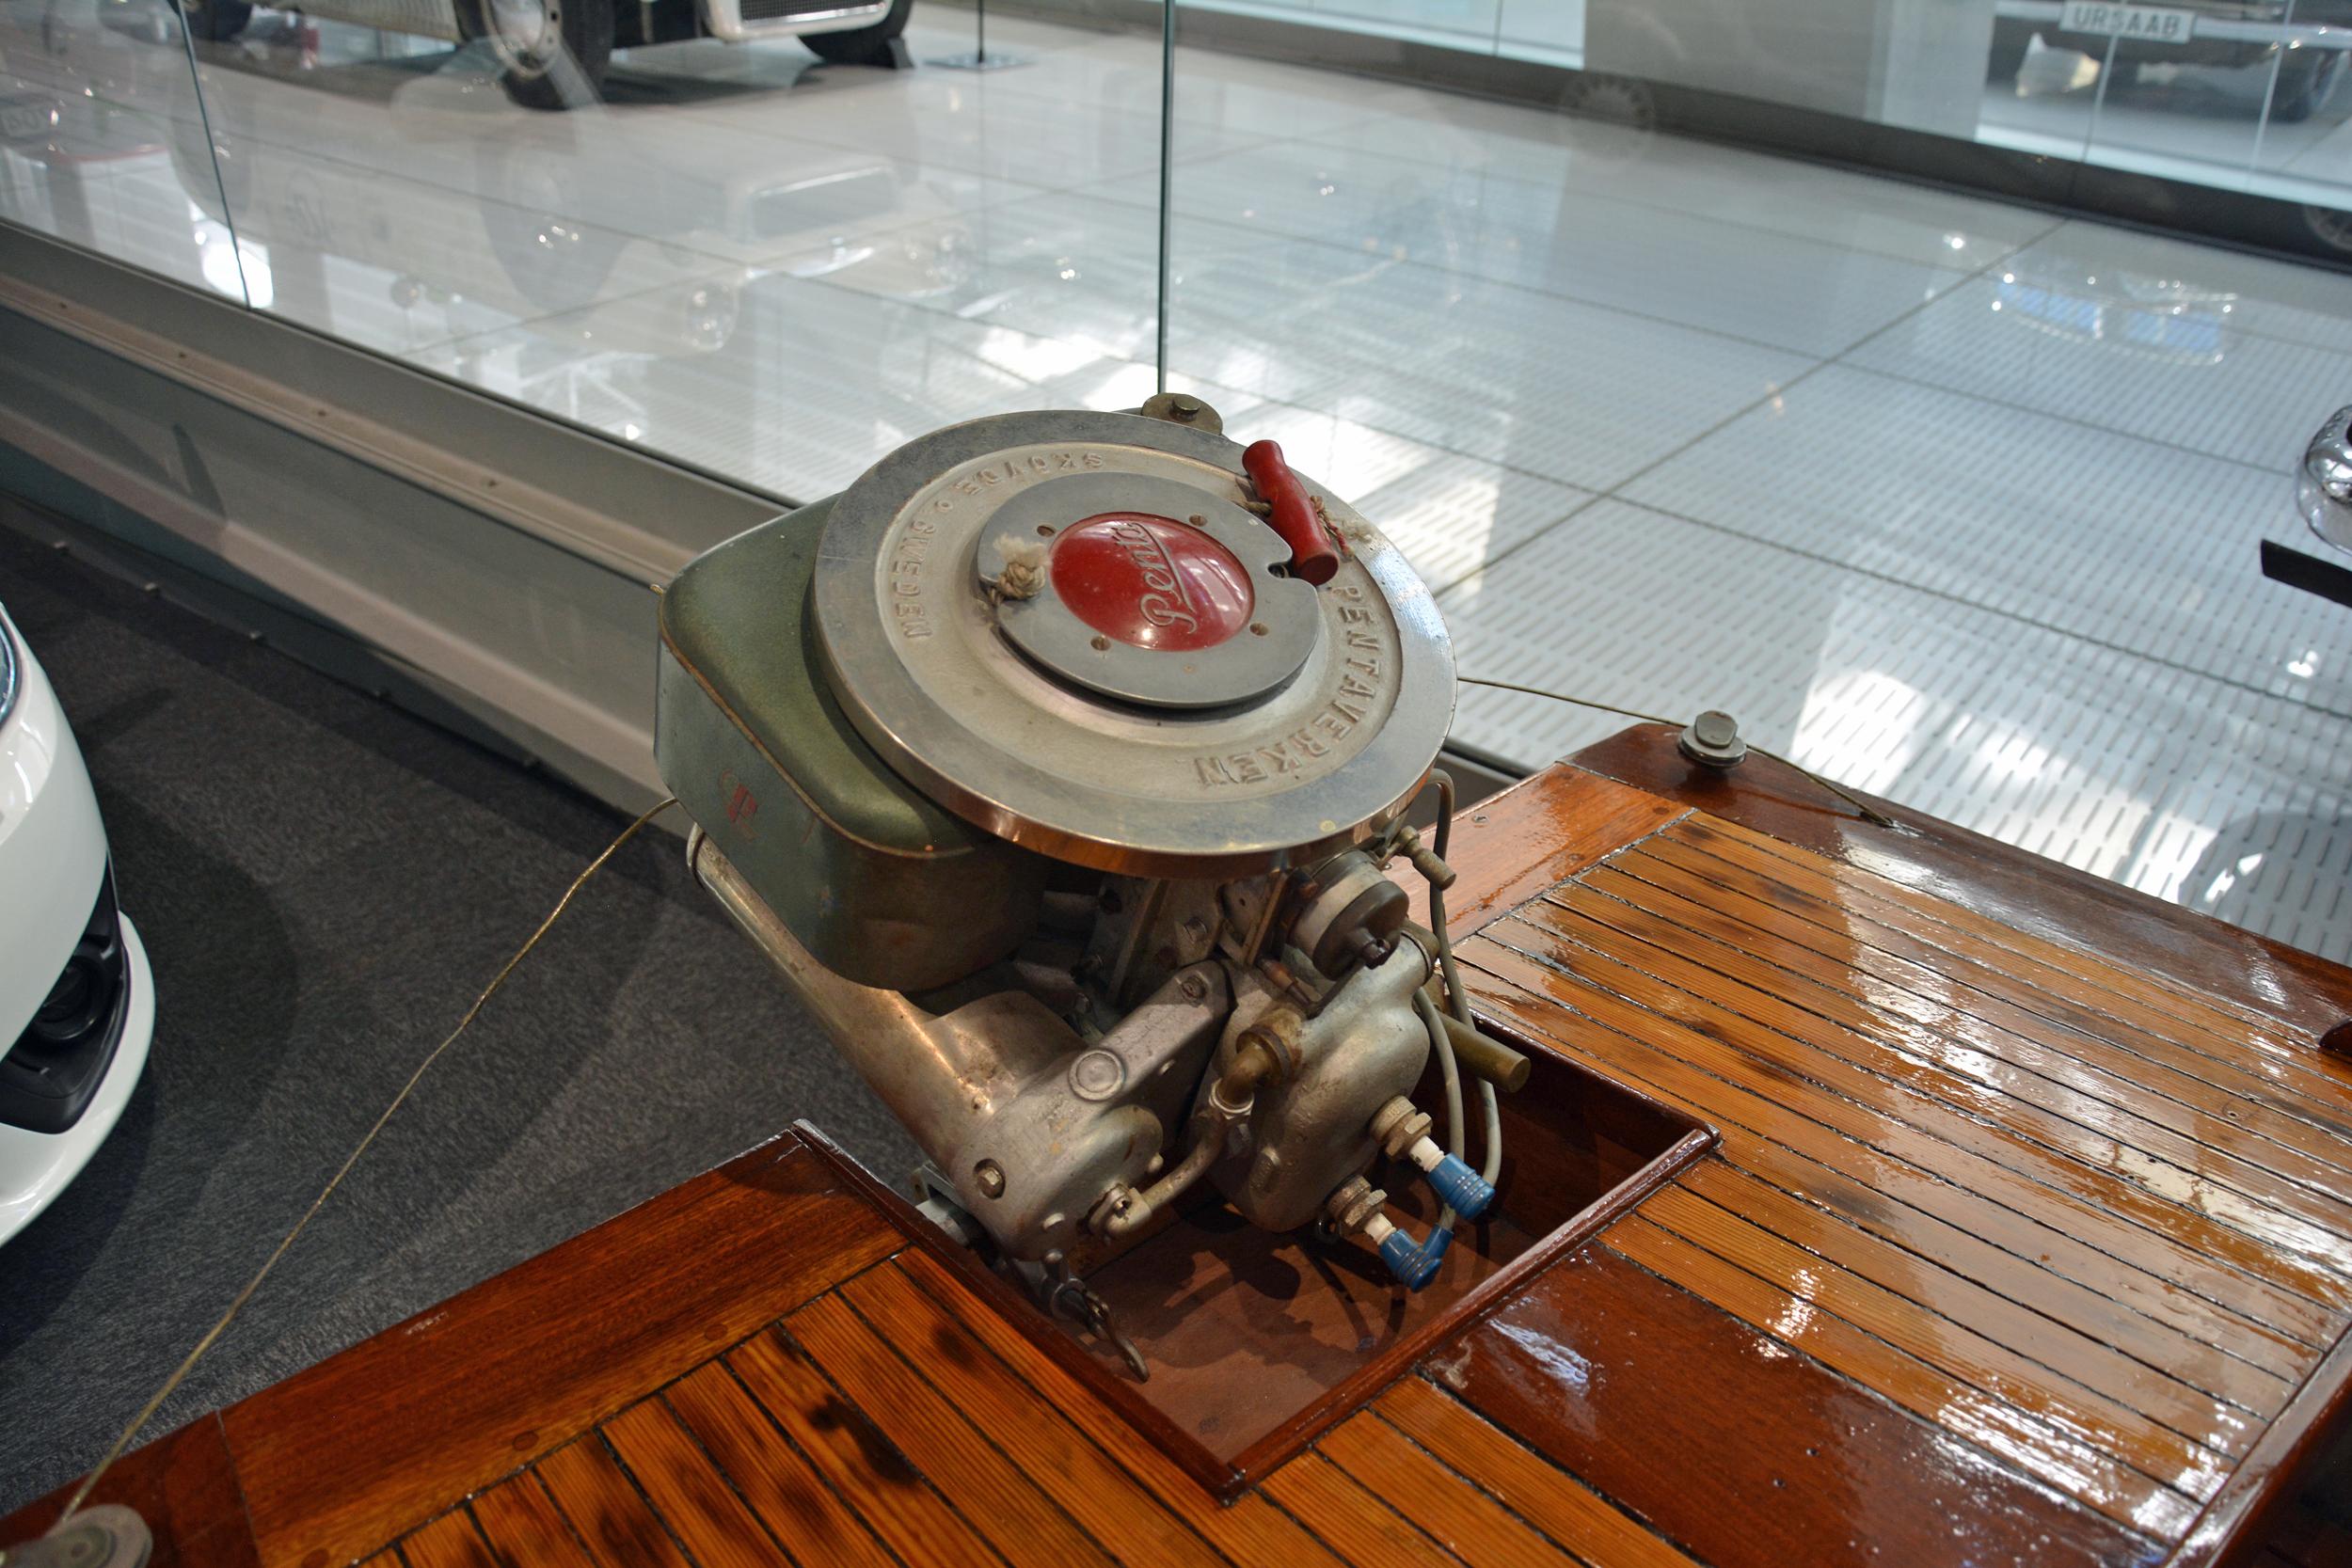 saab museum boat engine top